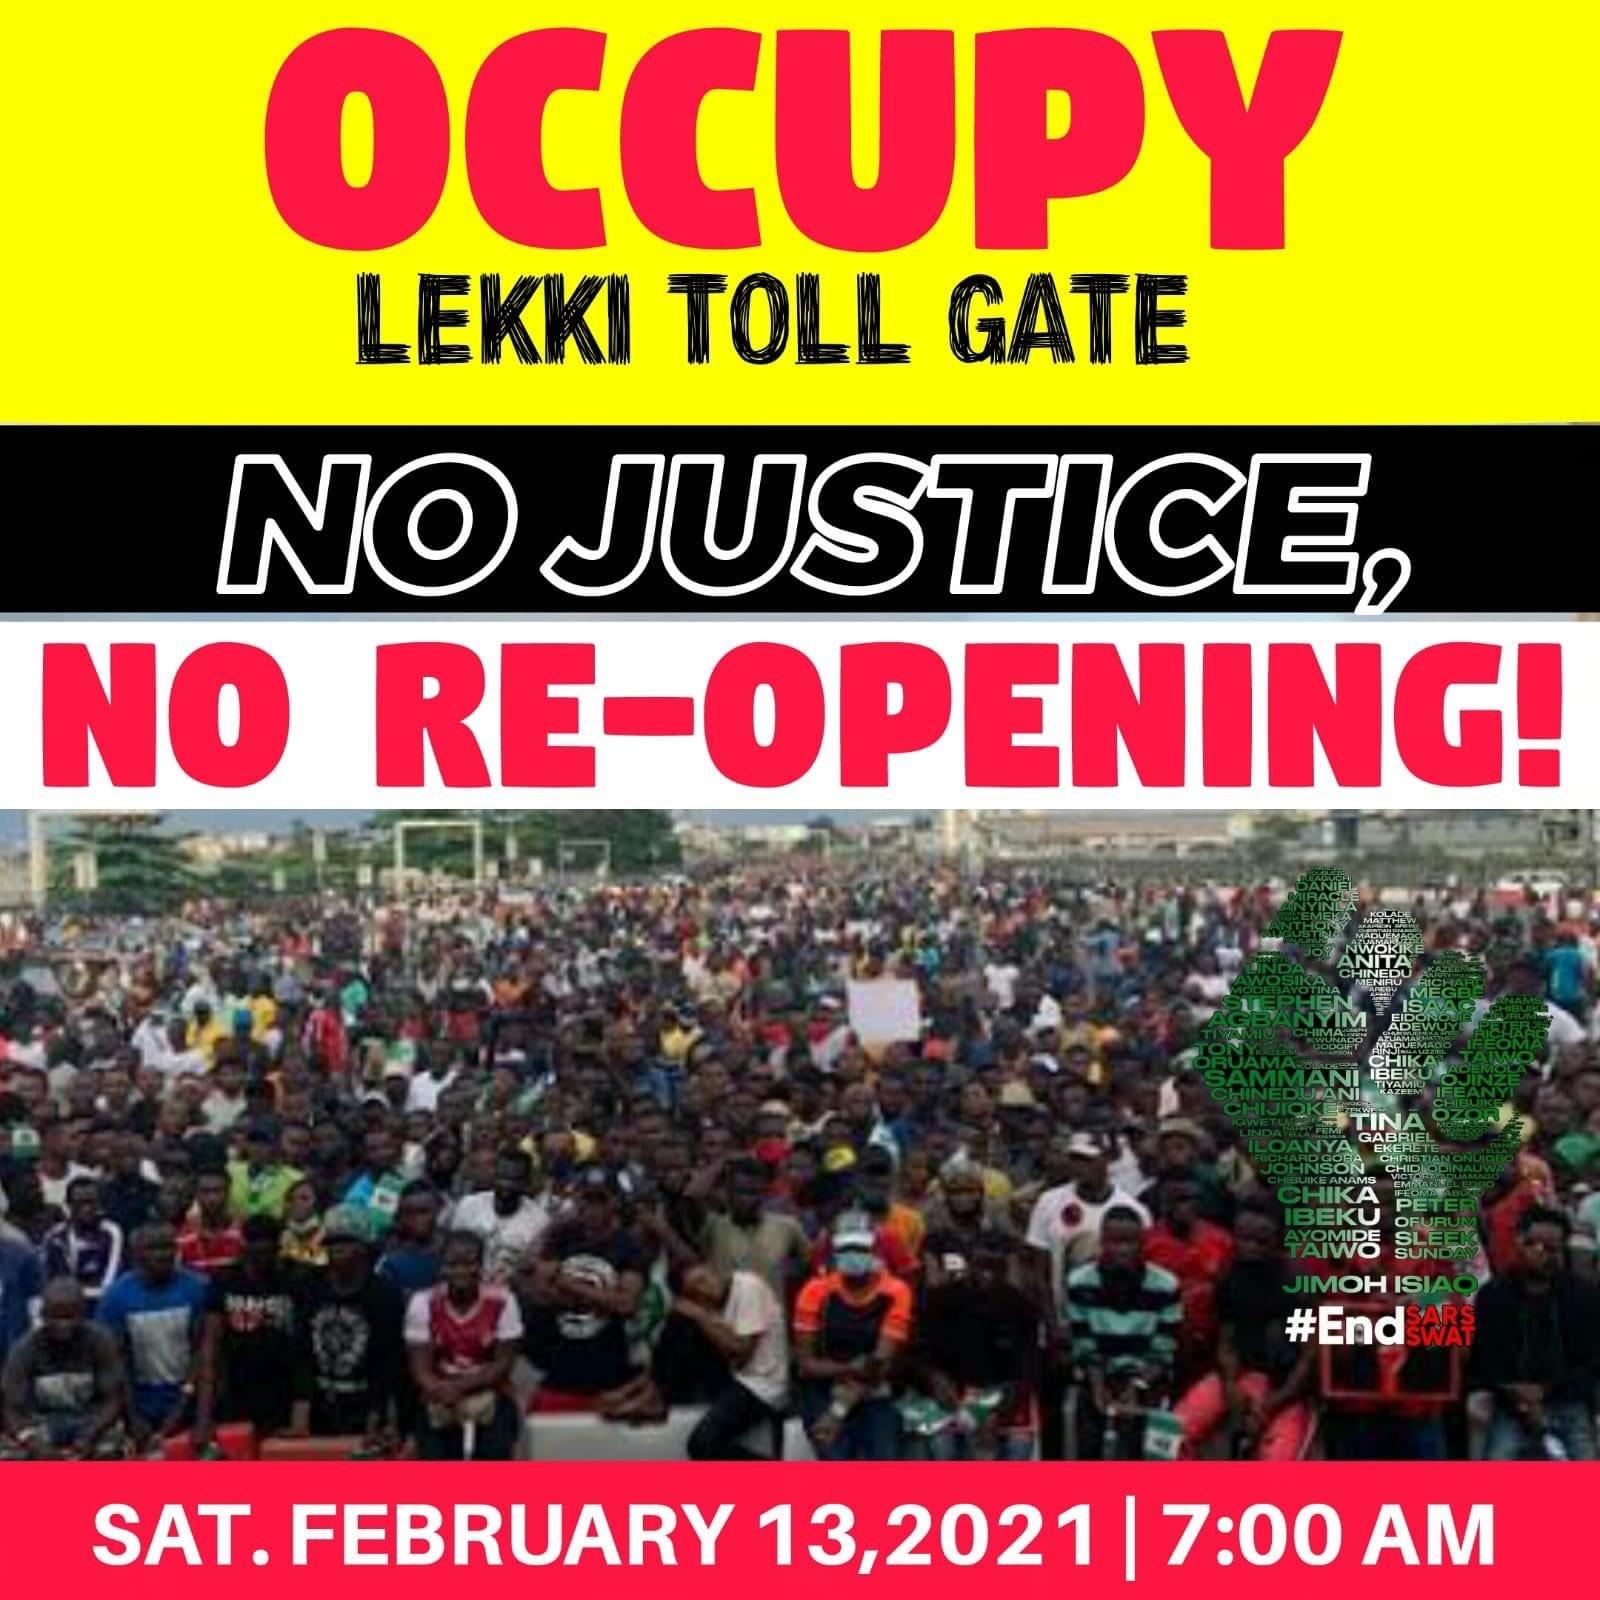 Youths set to shut Lekki toll gate over Injustice